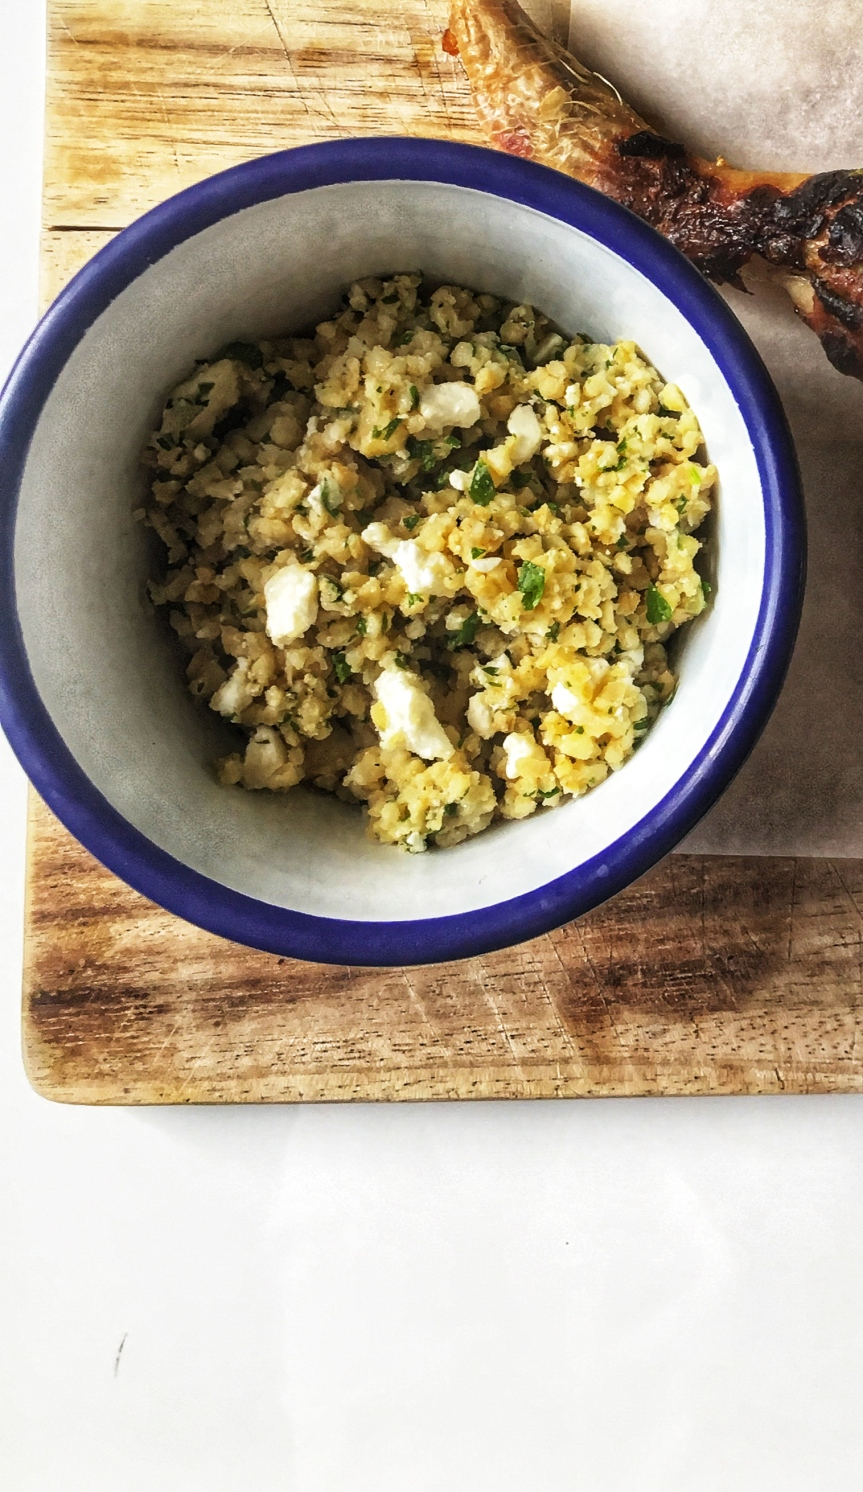 Bulgur Wheat, garlic, parsley and fetasalad